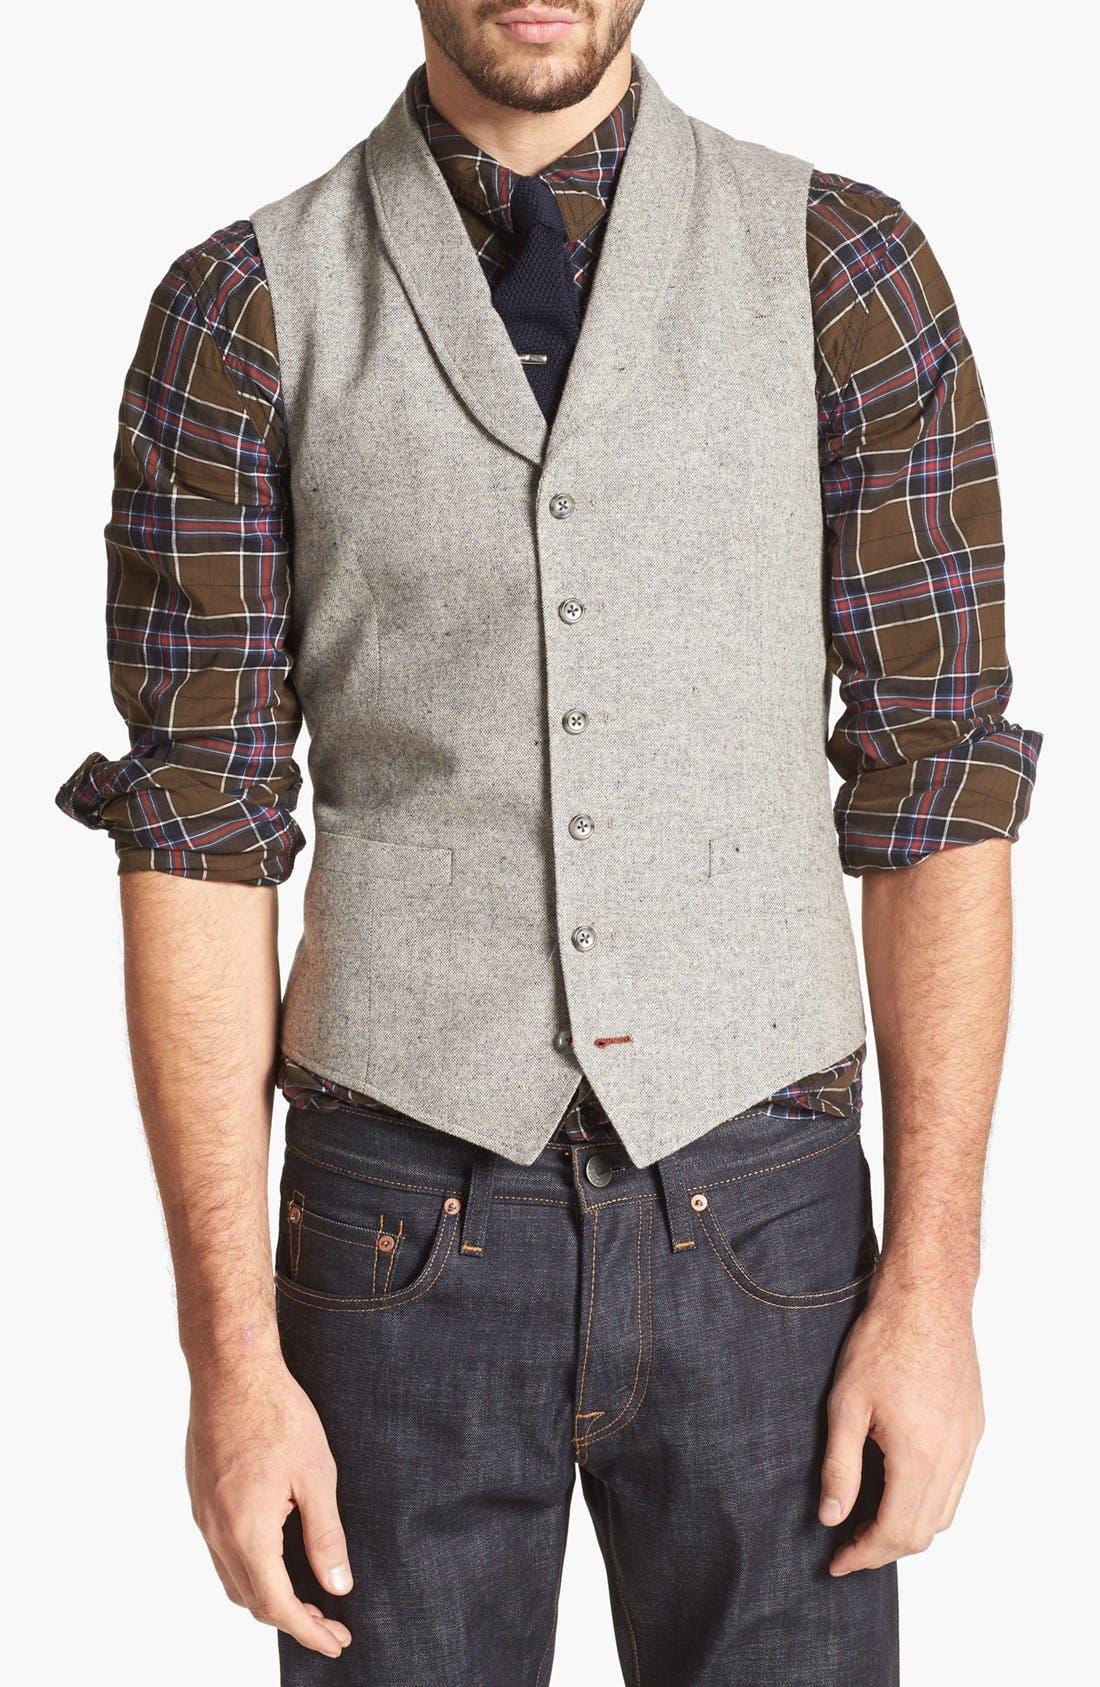 Main Image - 1901 Shawl Collar Grey Flannel Vest